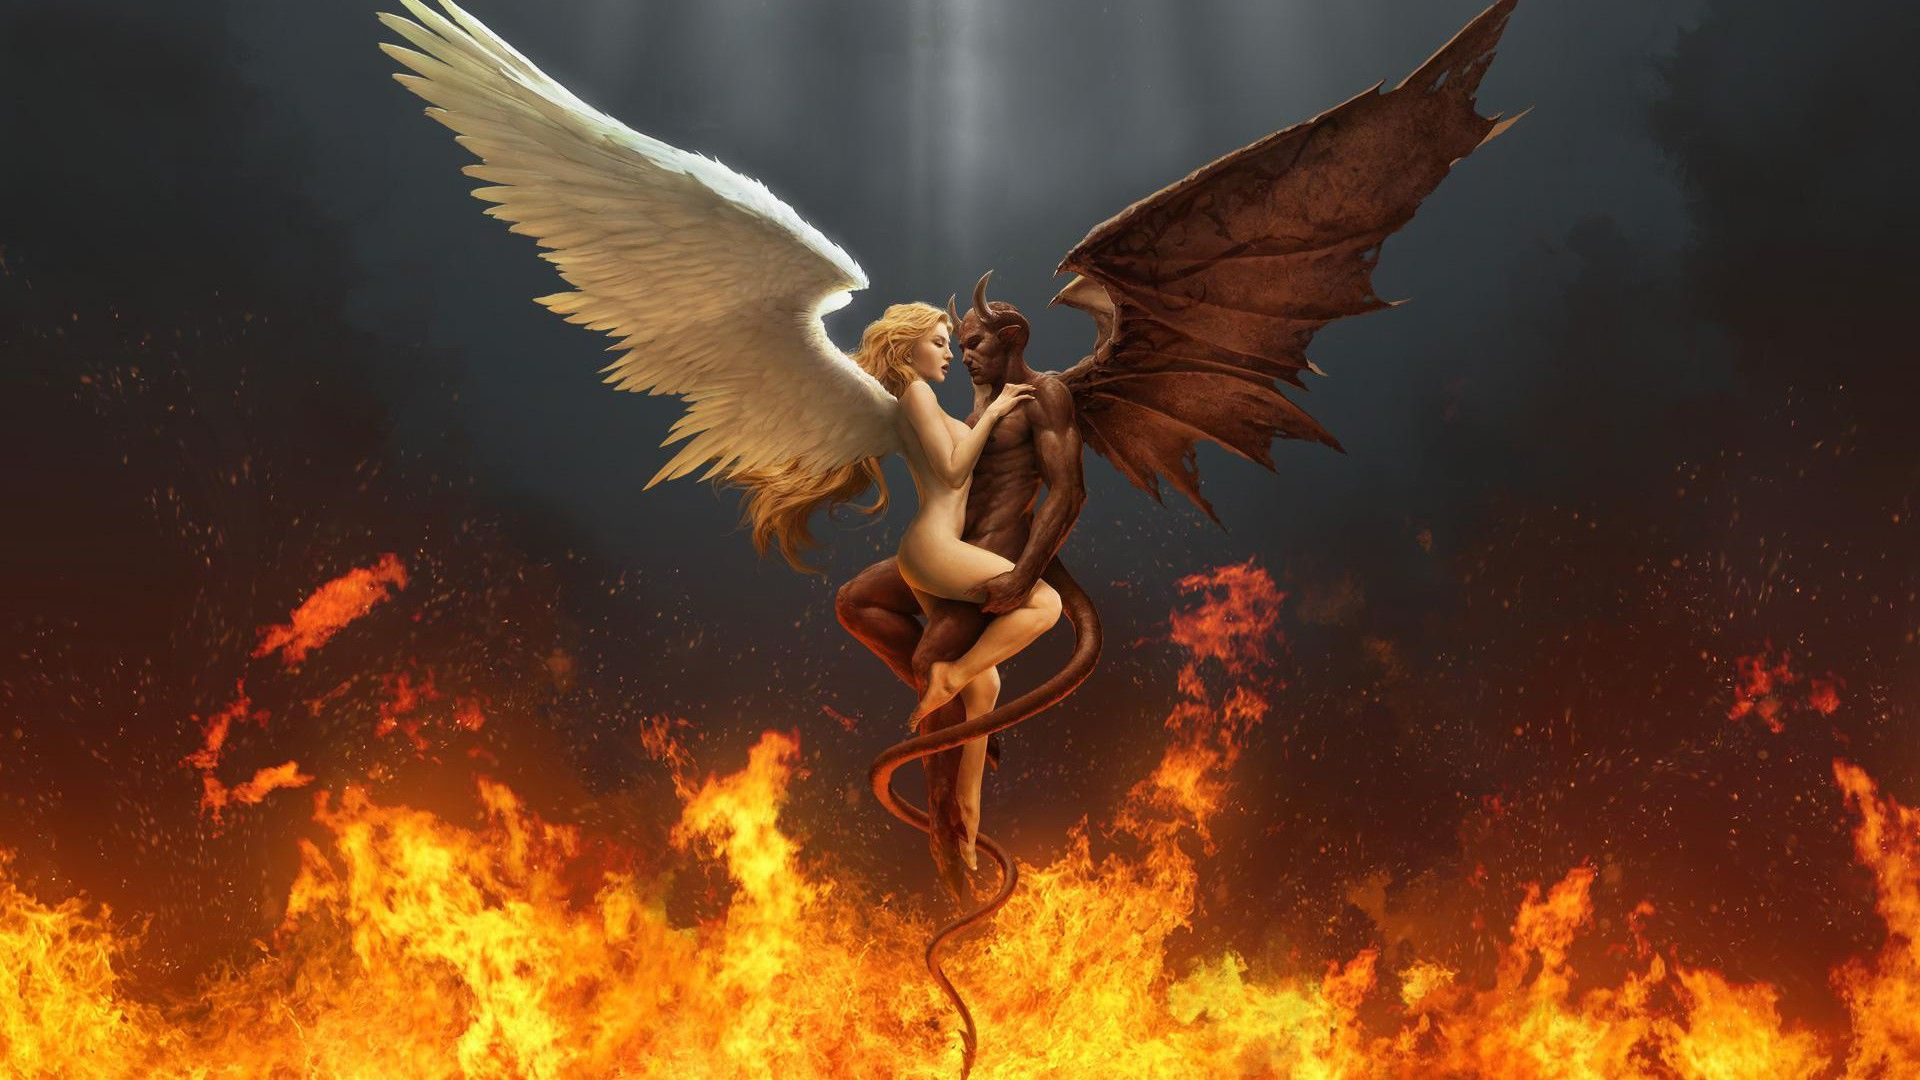 Wallpaper Devil And Angel